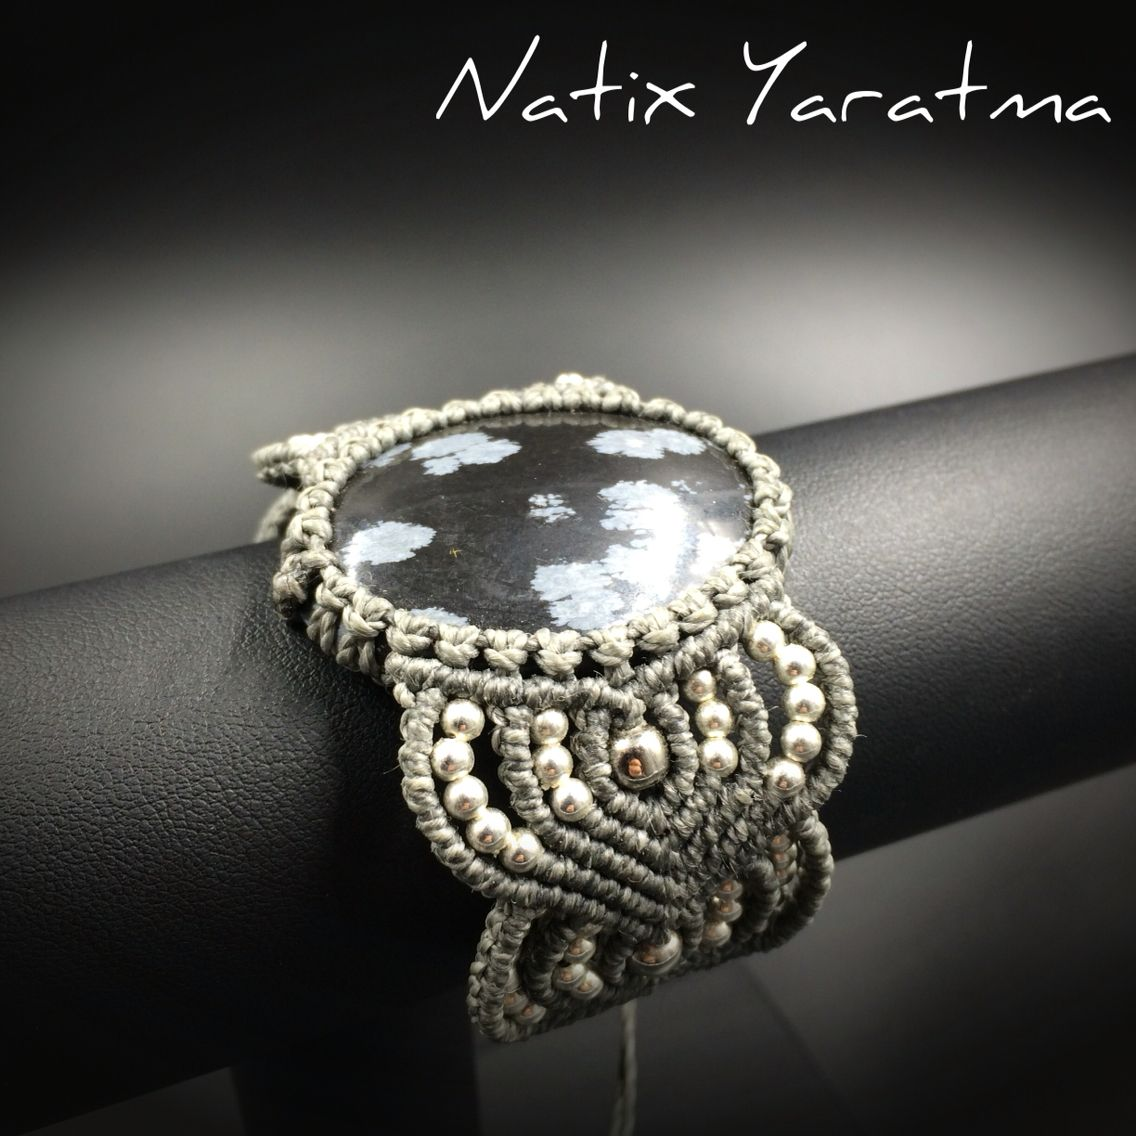 Macrame bracelet with black and white obsidian